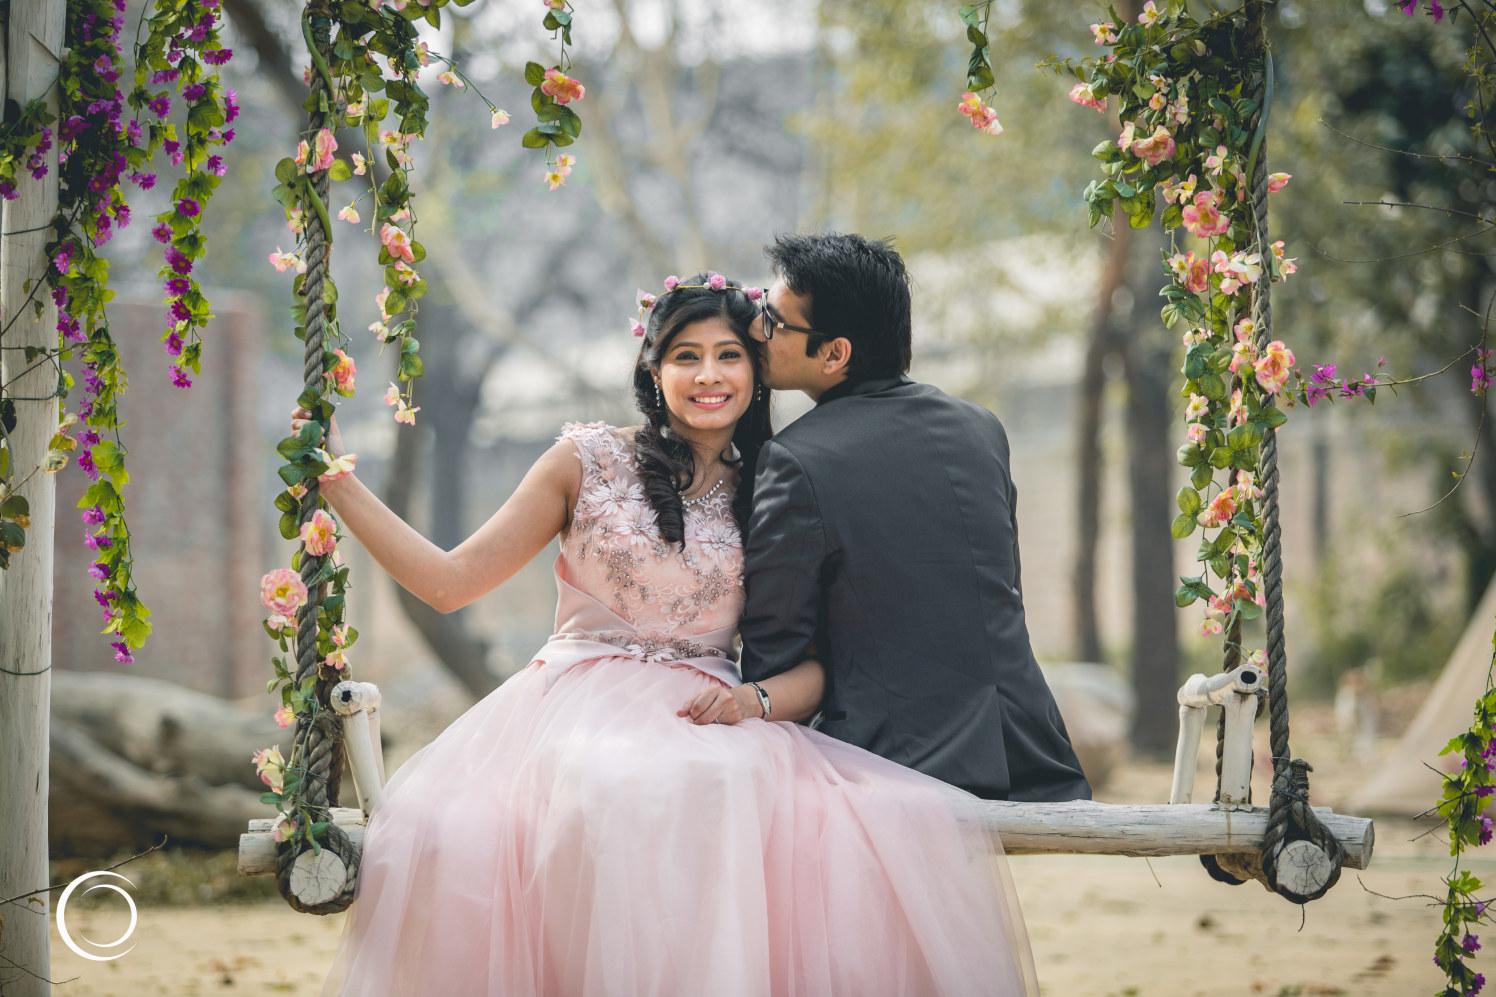 Graceful by Amish Photography Wedding-photography | Weddings Photos & Ideas